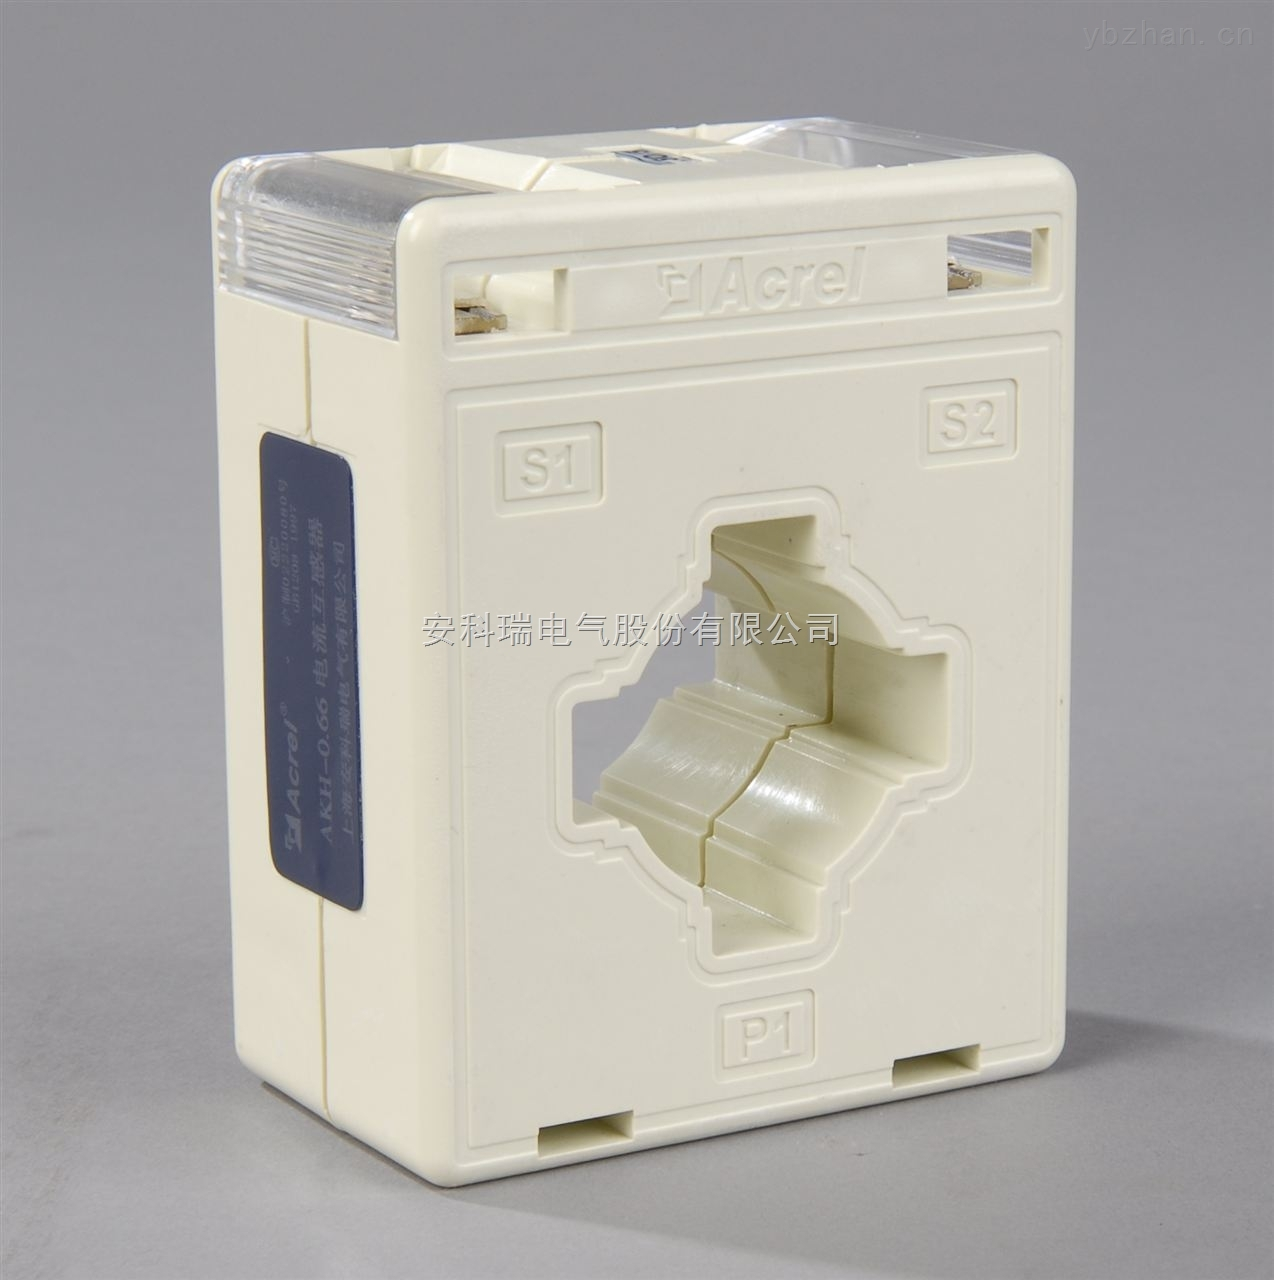 AKH-0.66系列测量型电流互感器